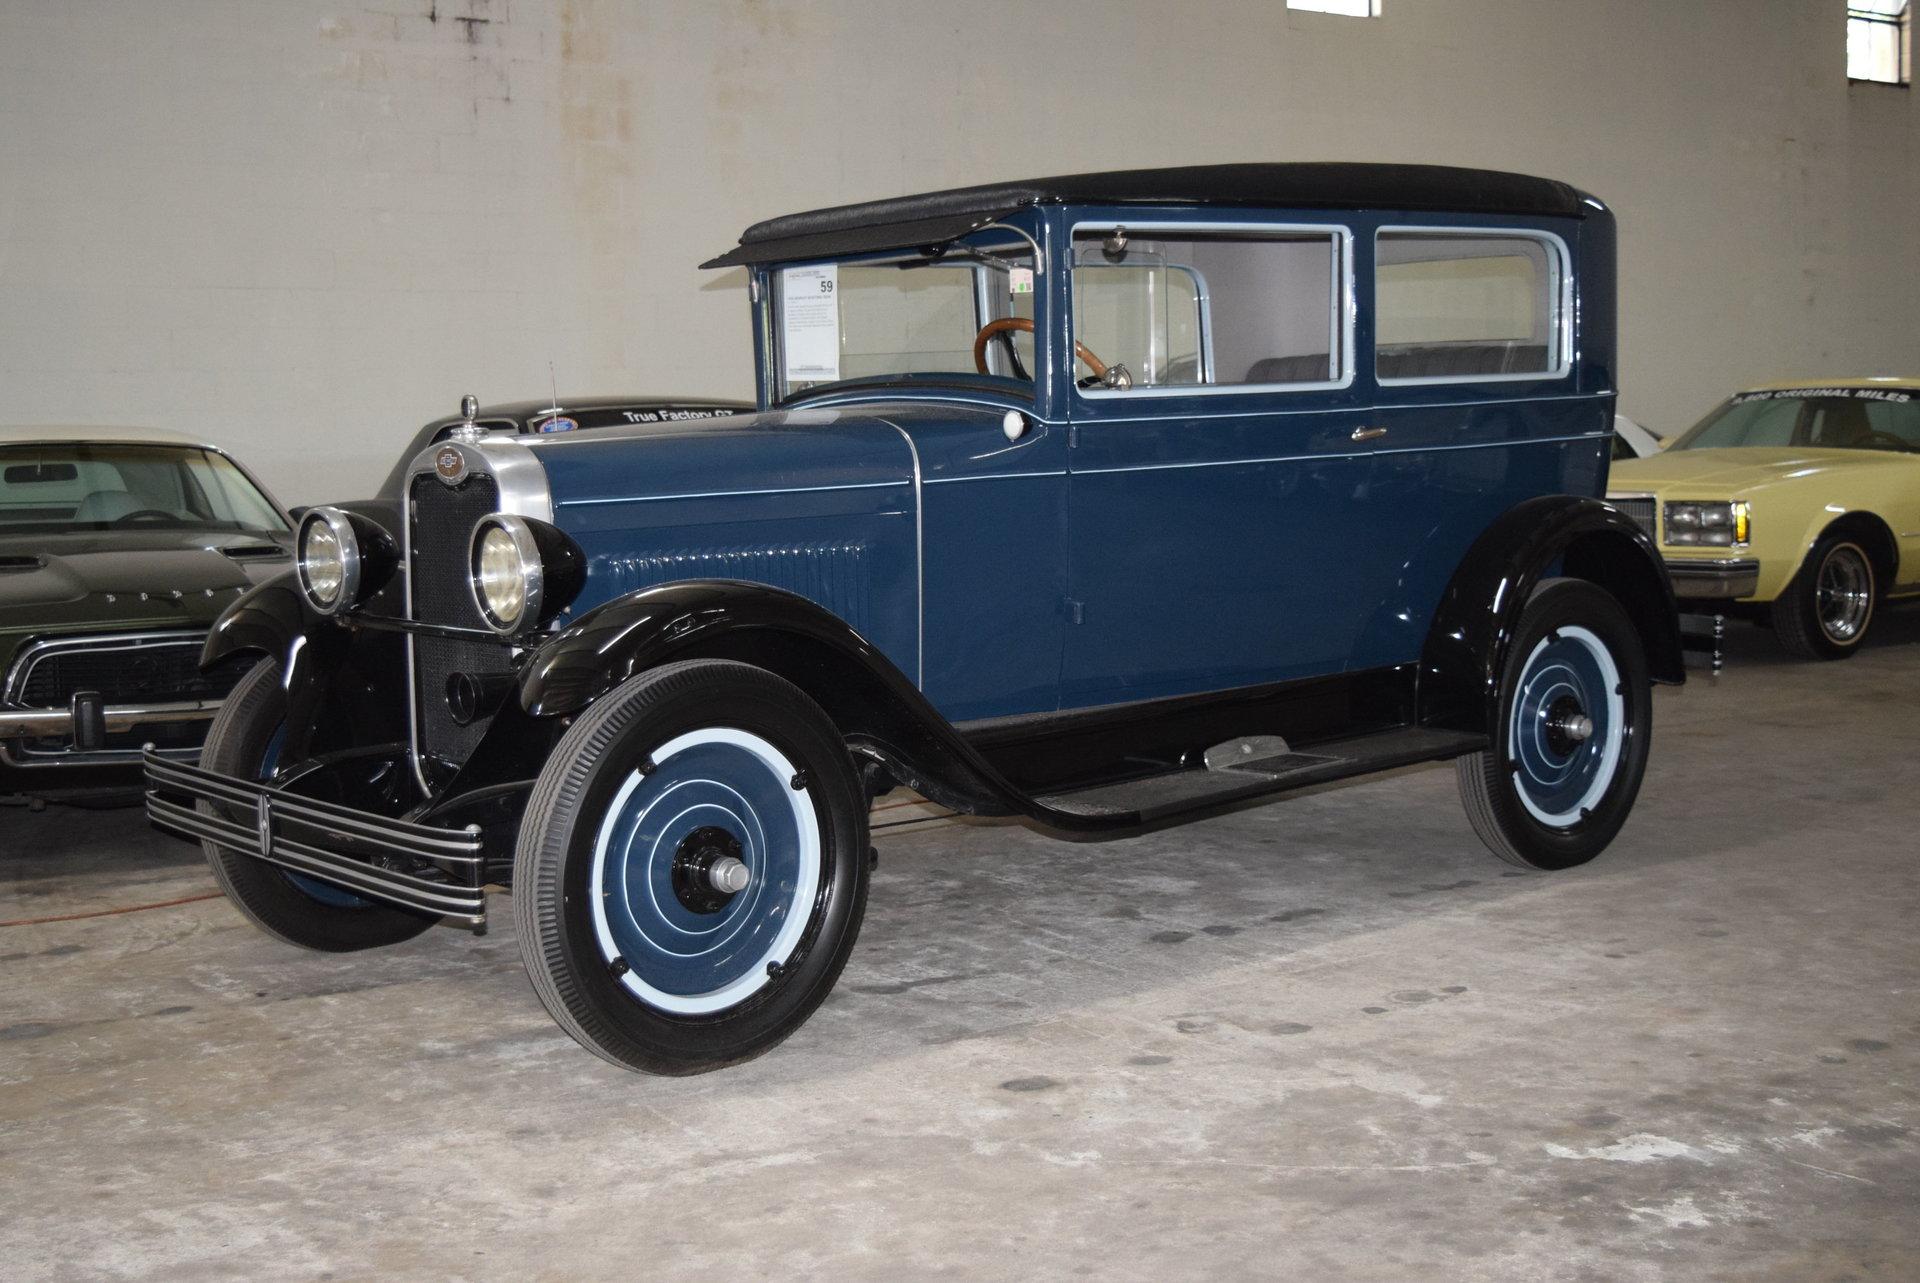 1928 Chevrolet AB 2 dr Sedan